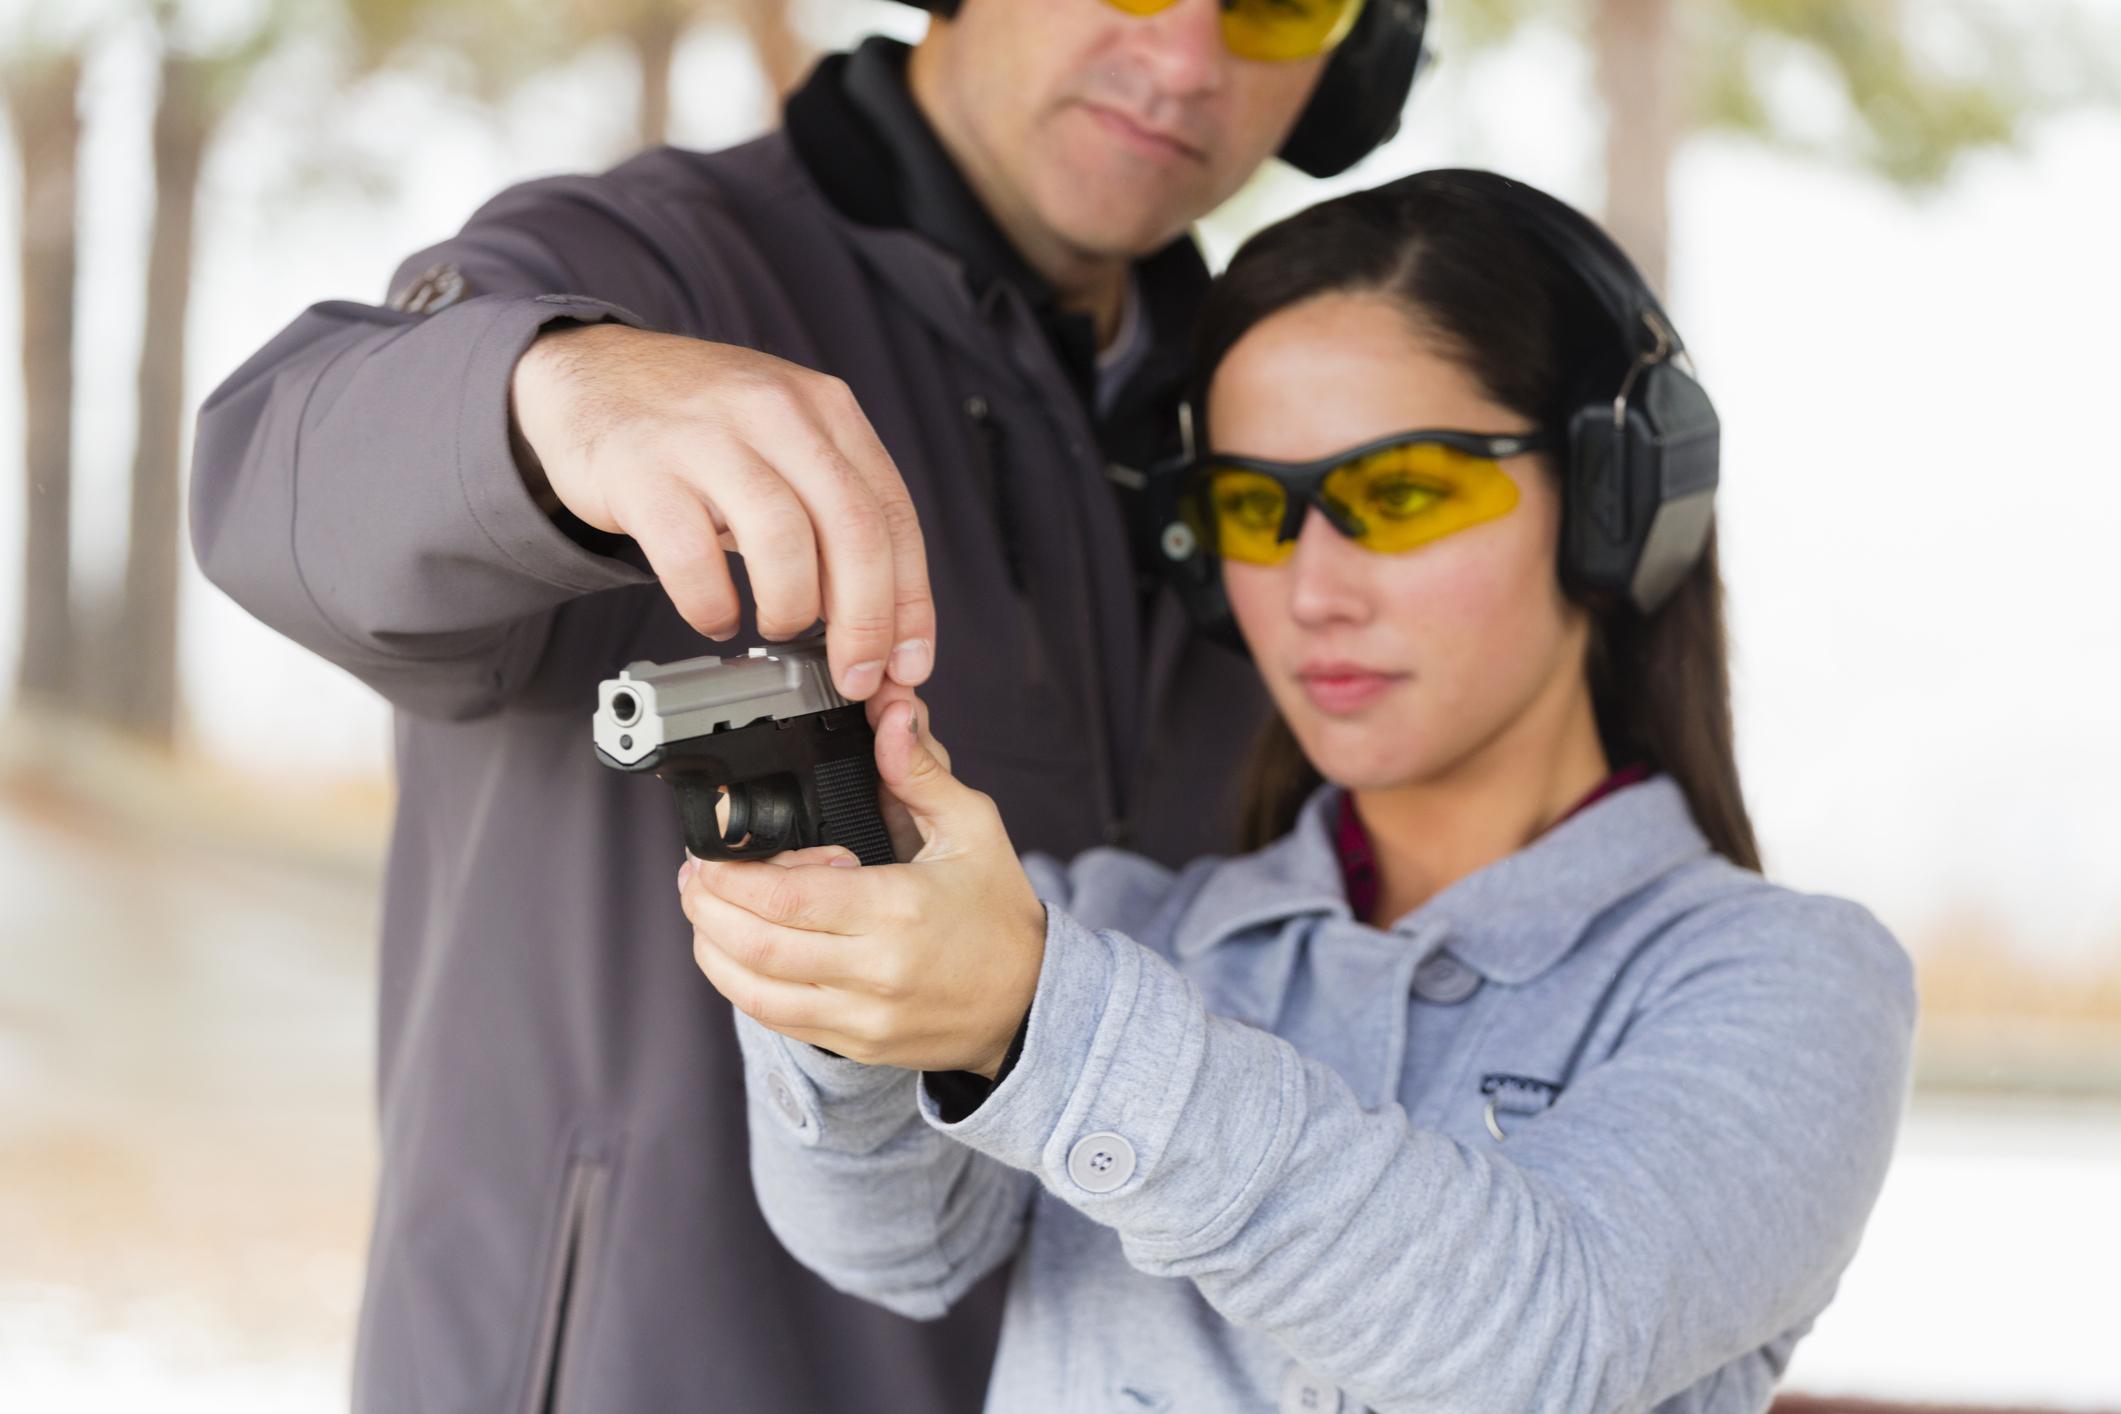 A woman receives instruction at a gun range.